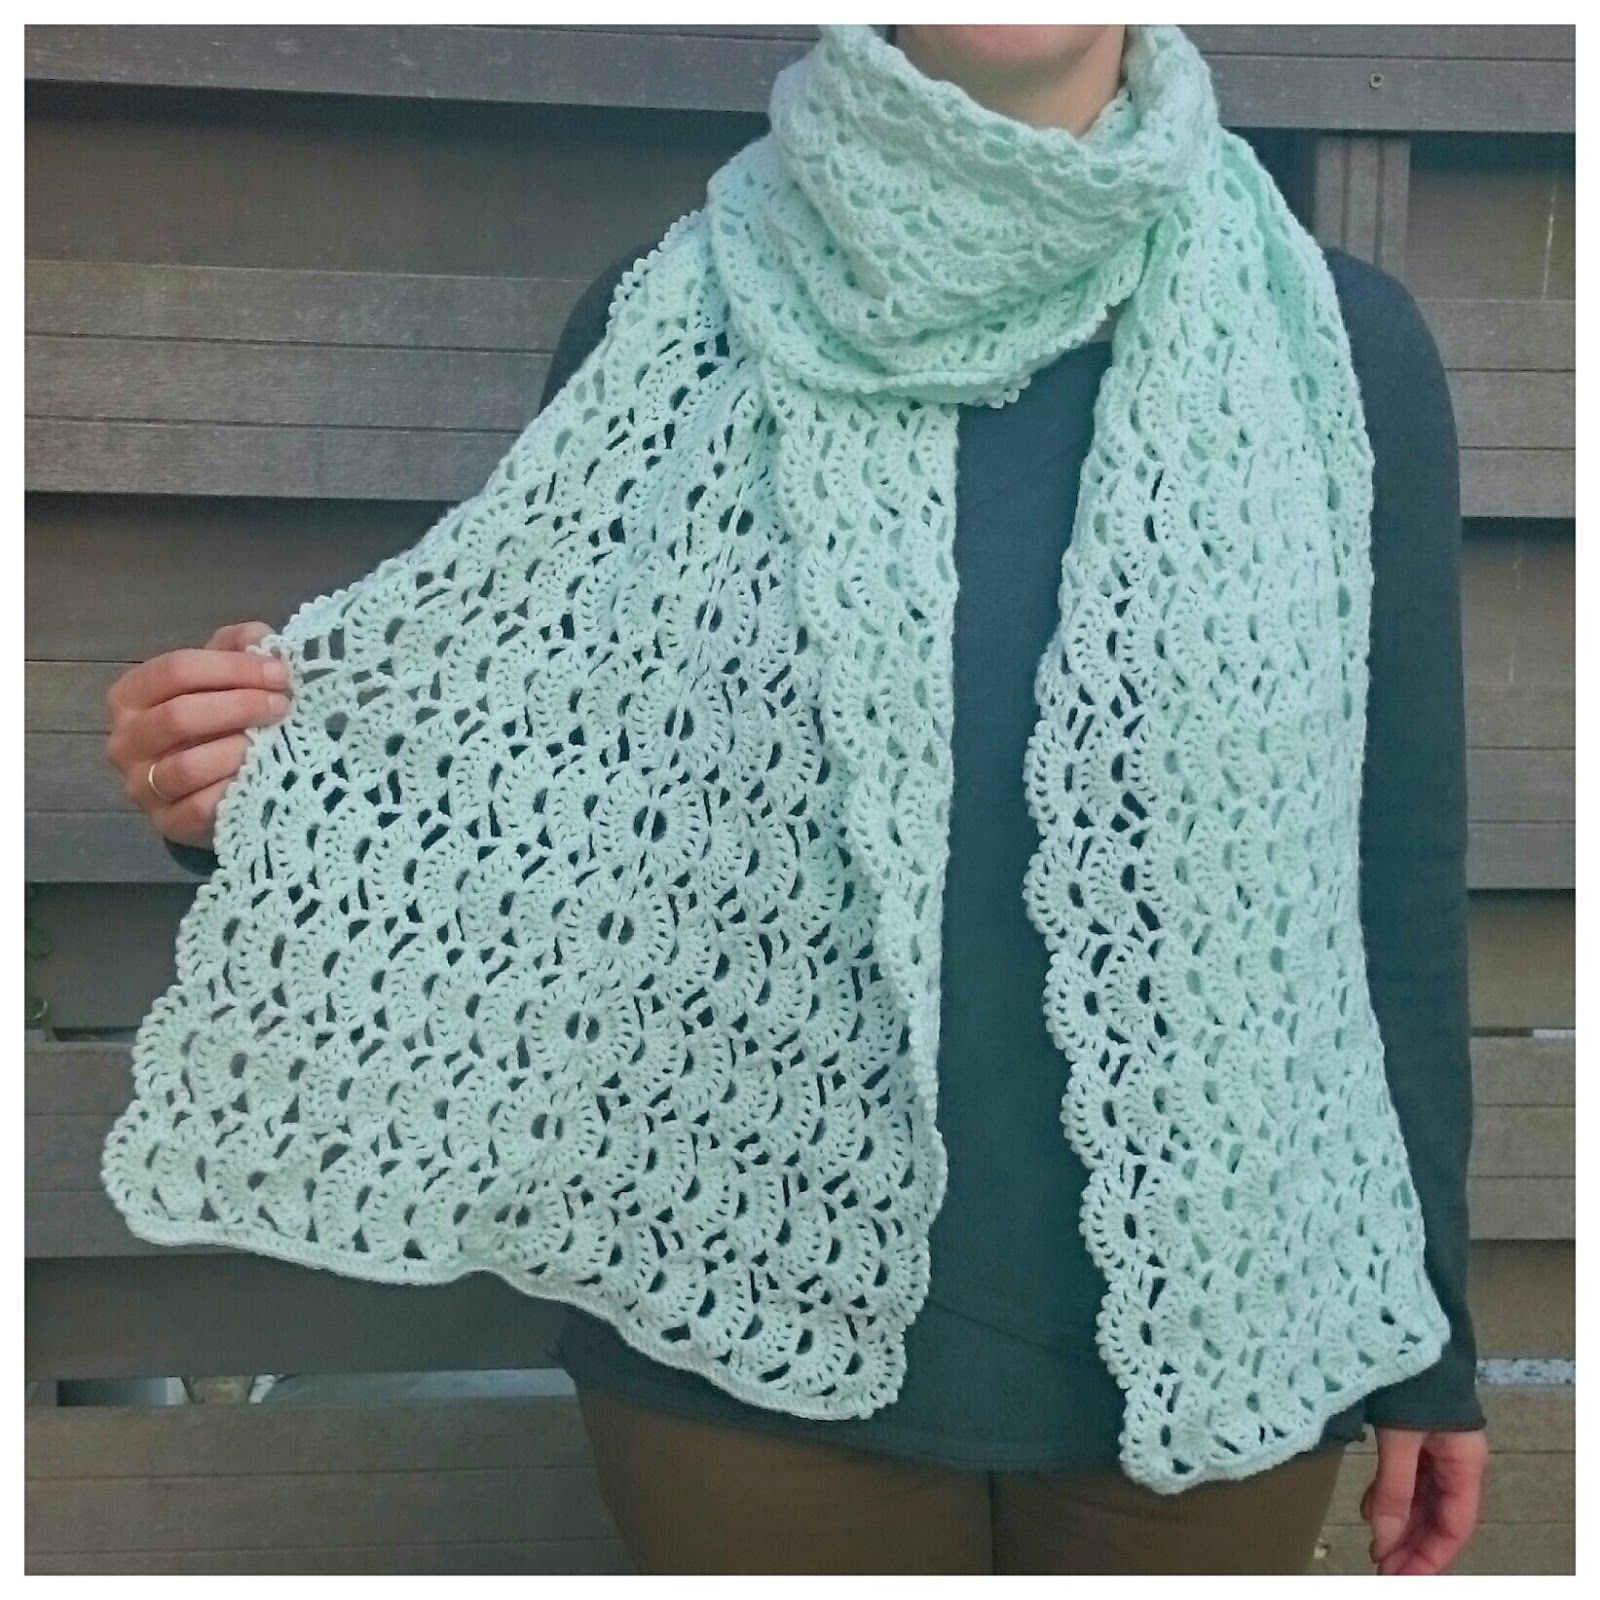 Kanten Sjaal Haken Gehaakt Crochet Knitting Pinterest Crochet